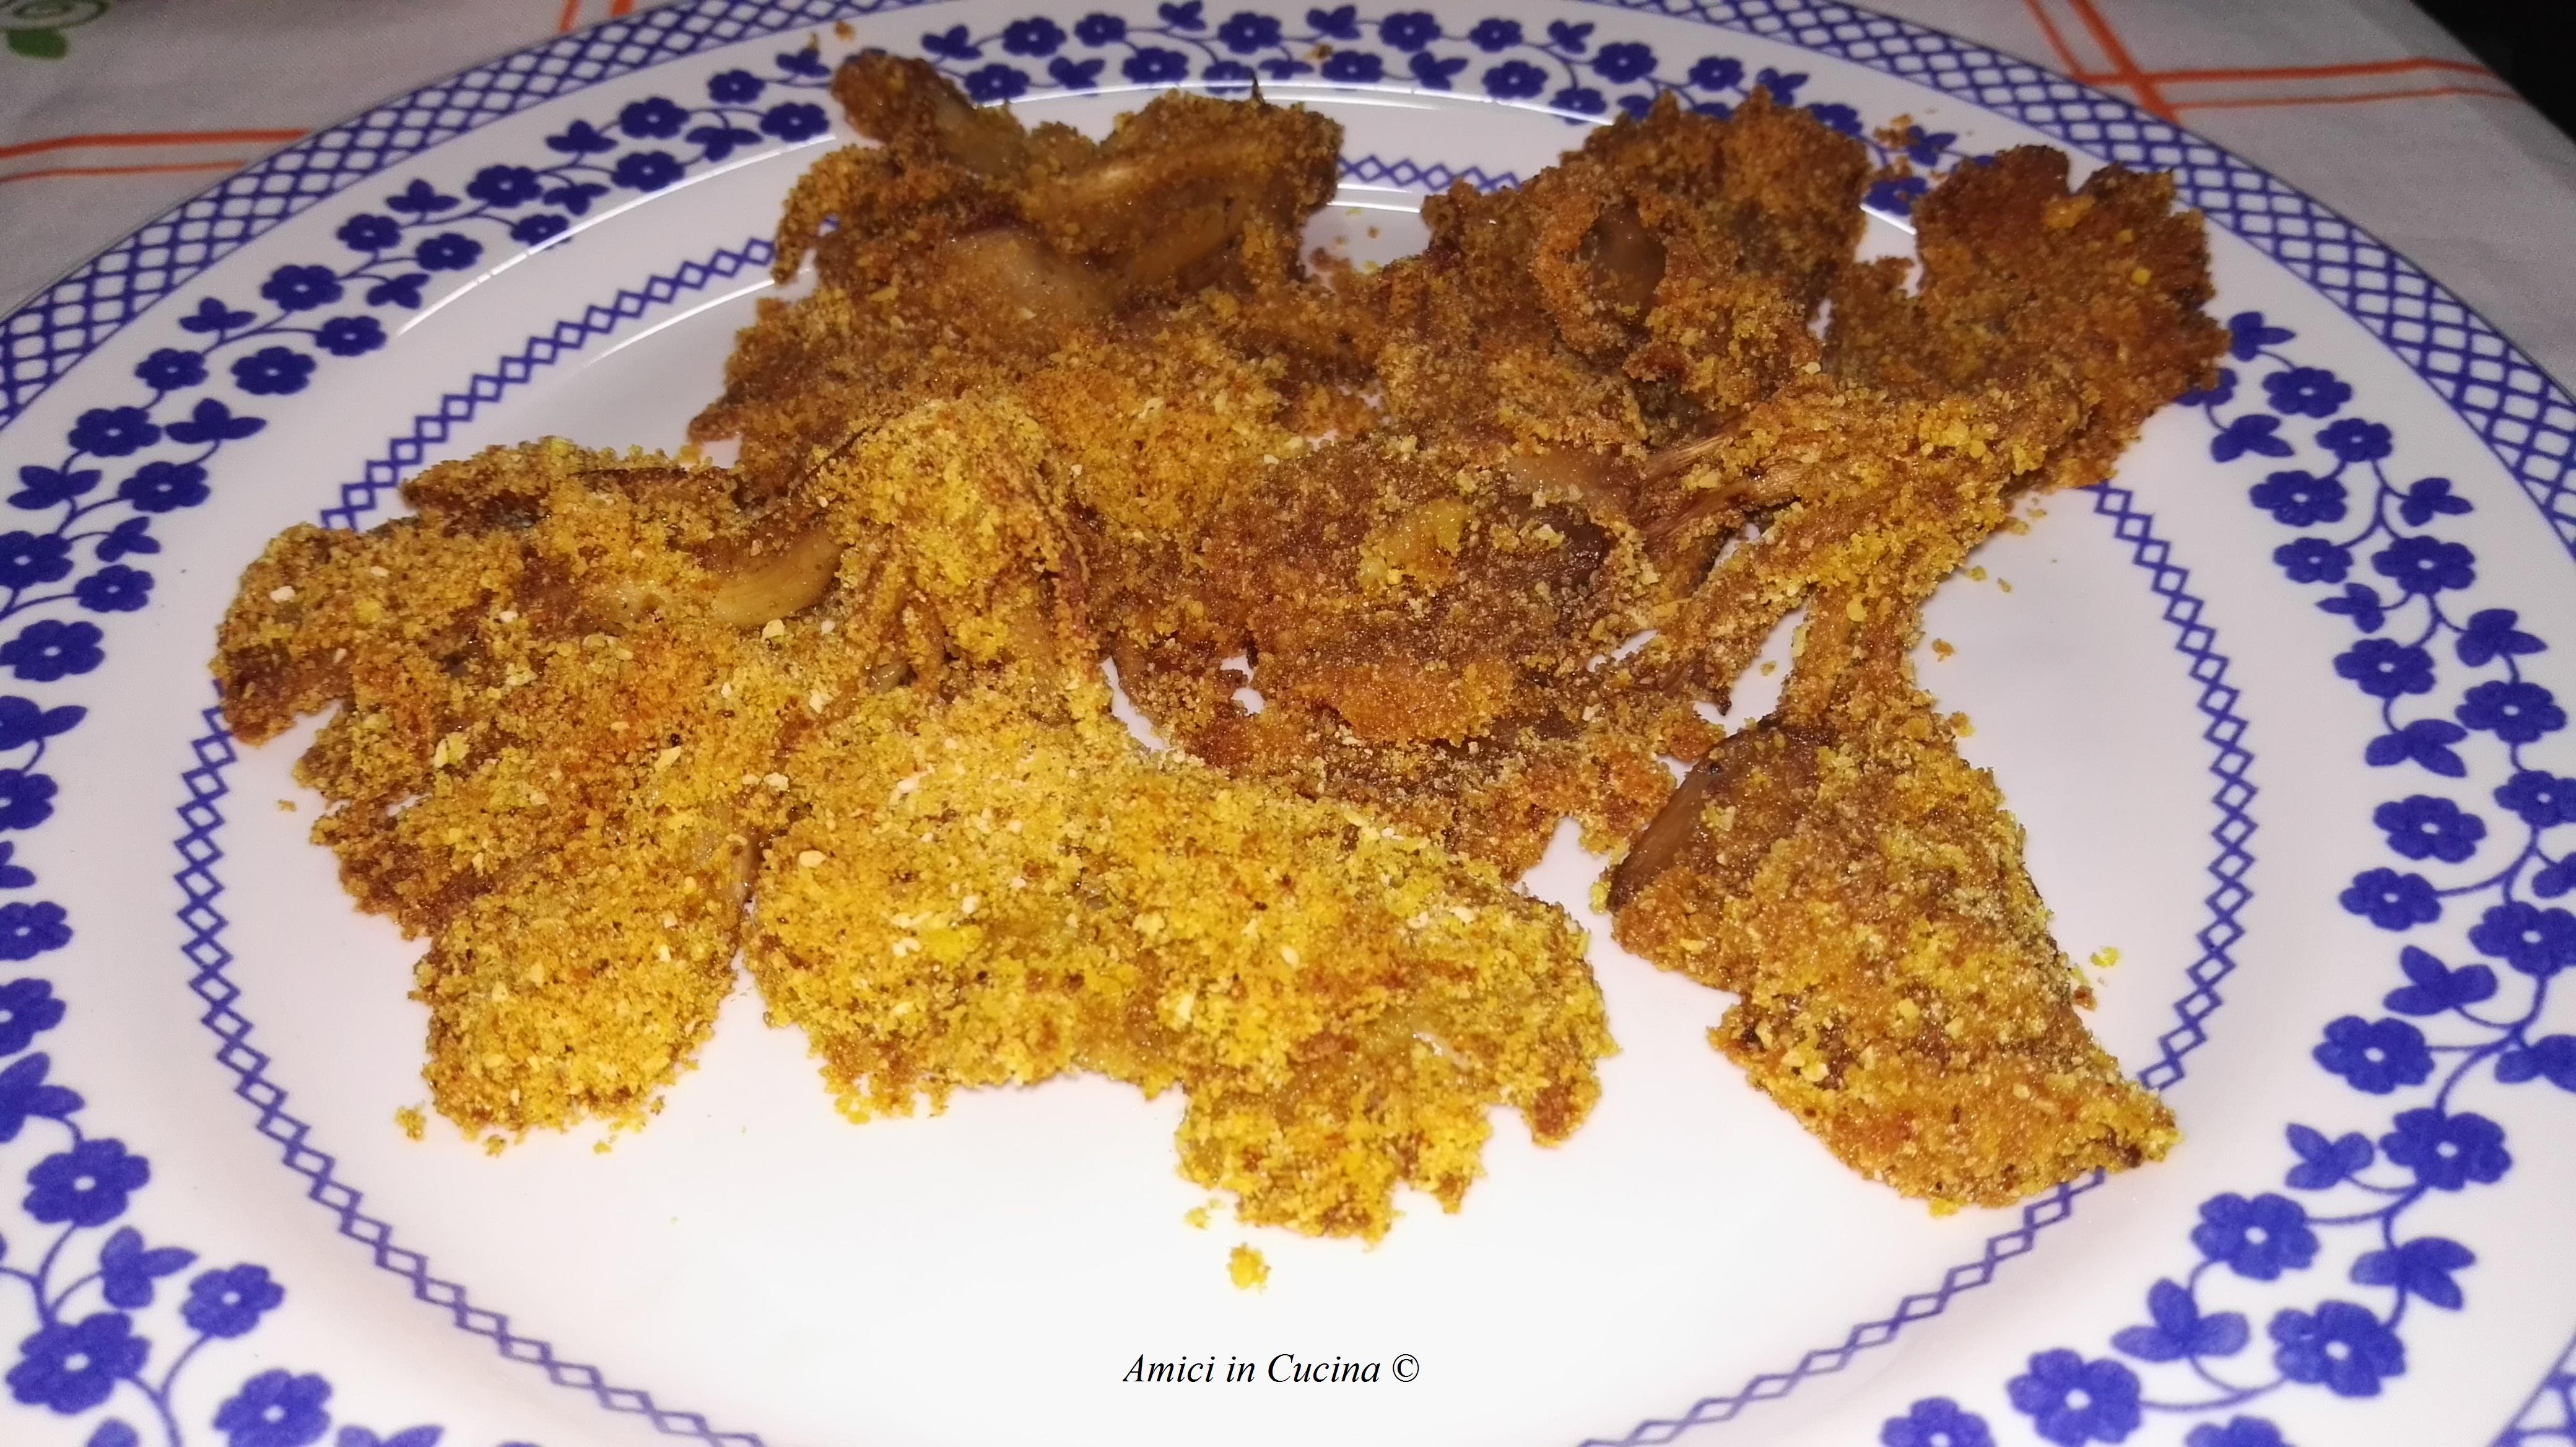 Funghi Pleurotus ostreatus panati al forno